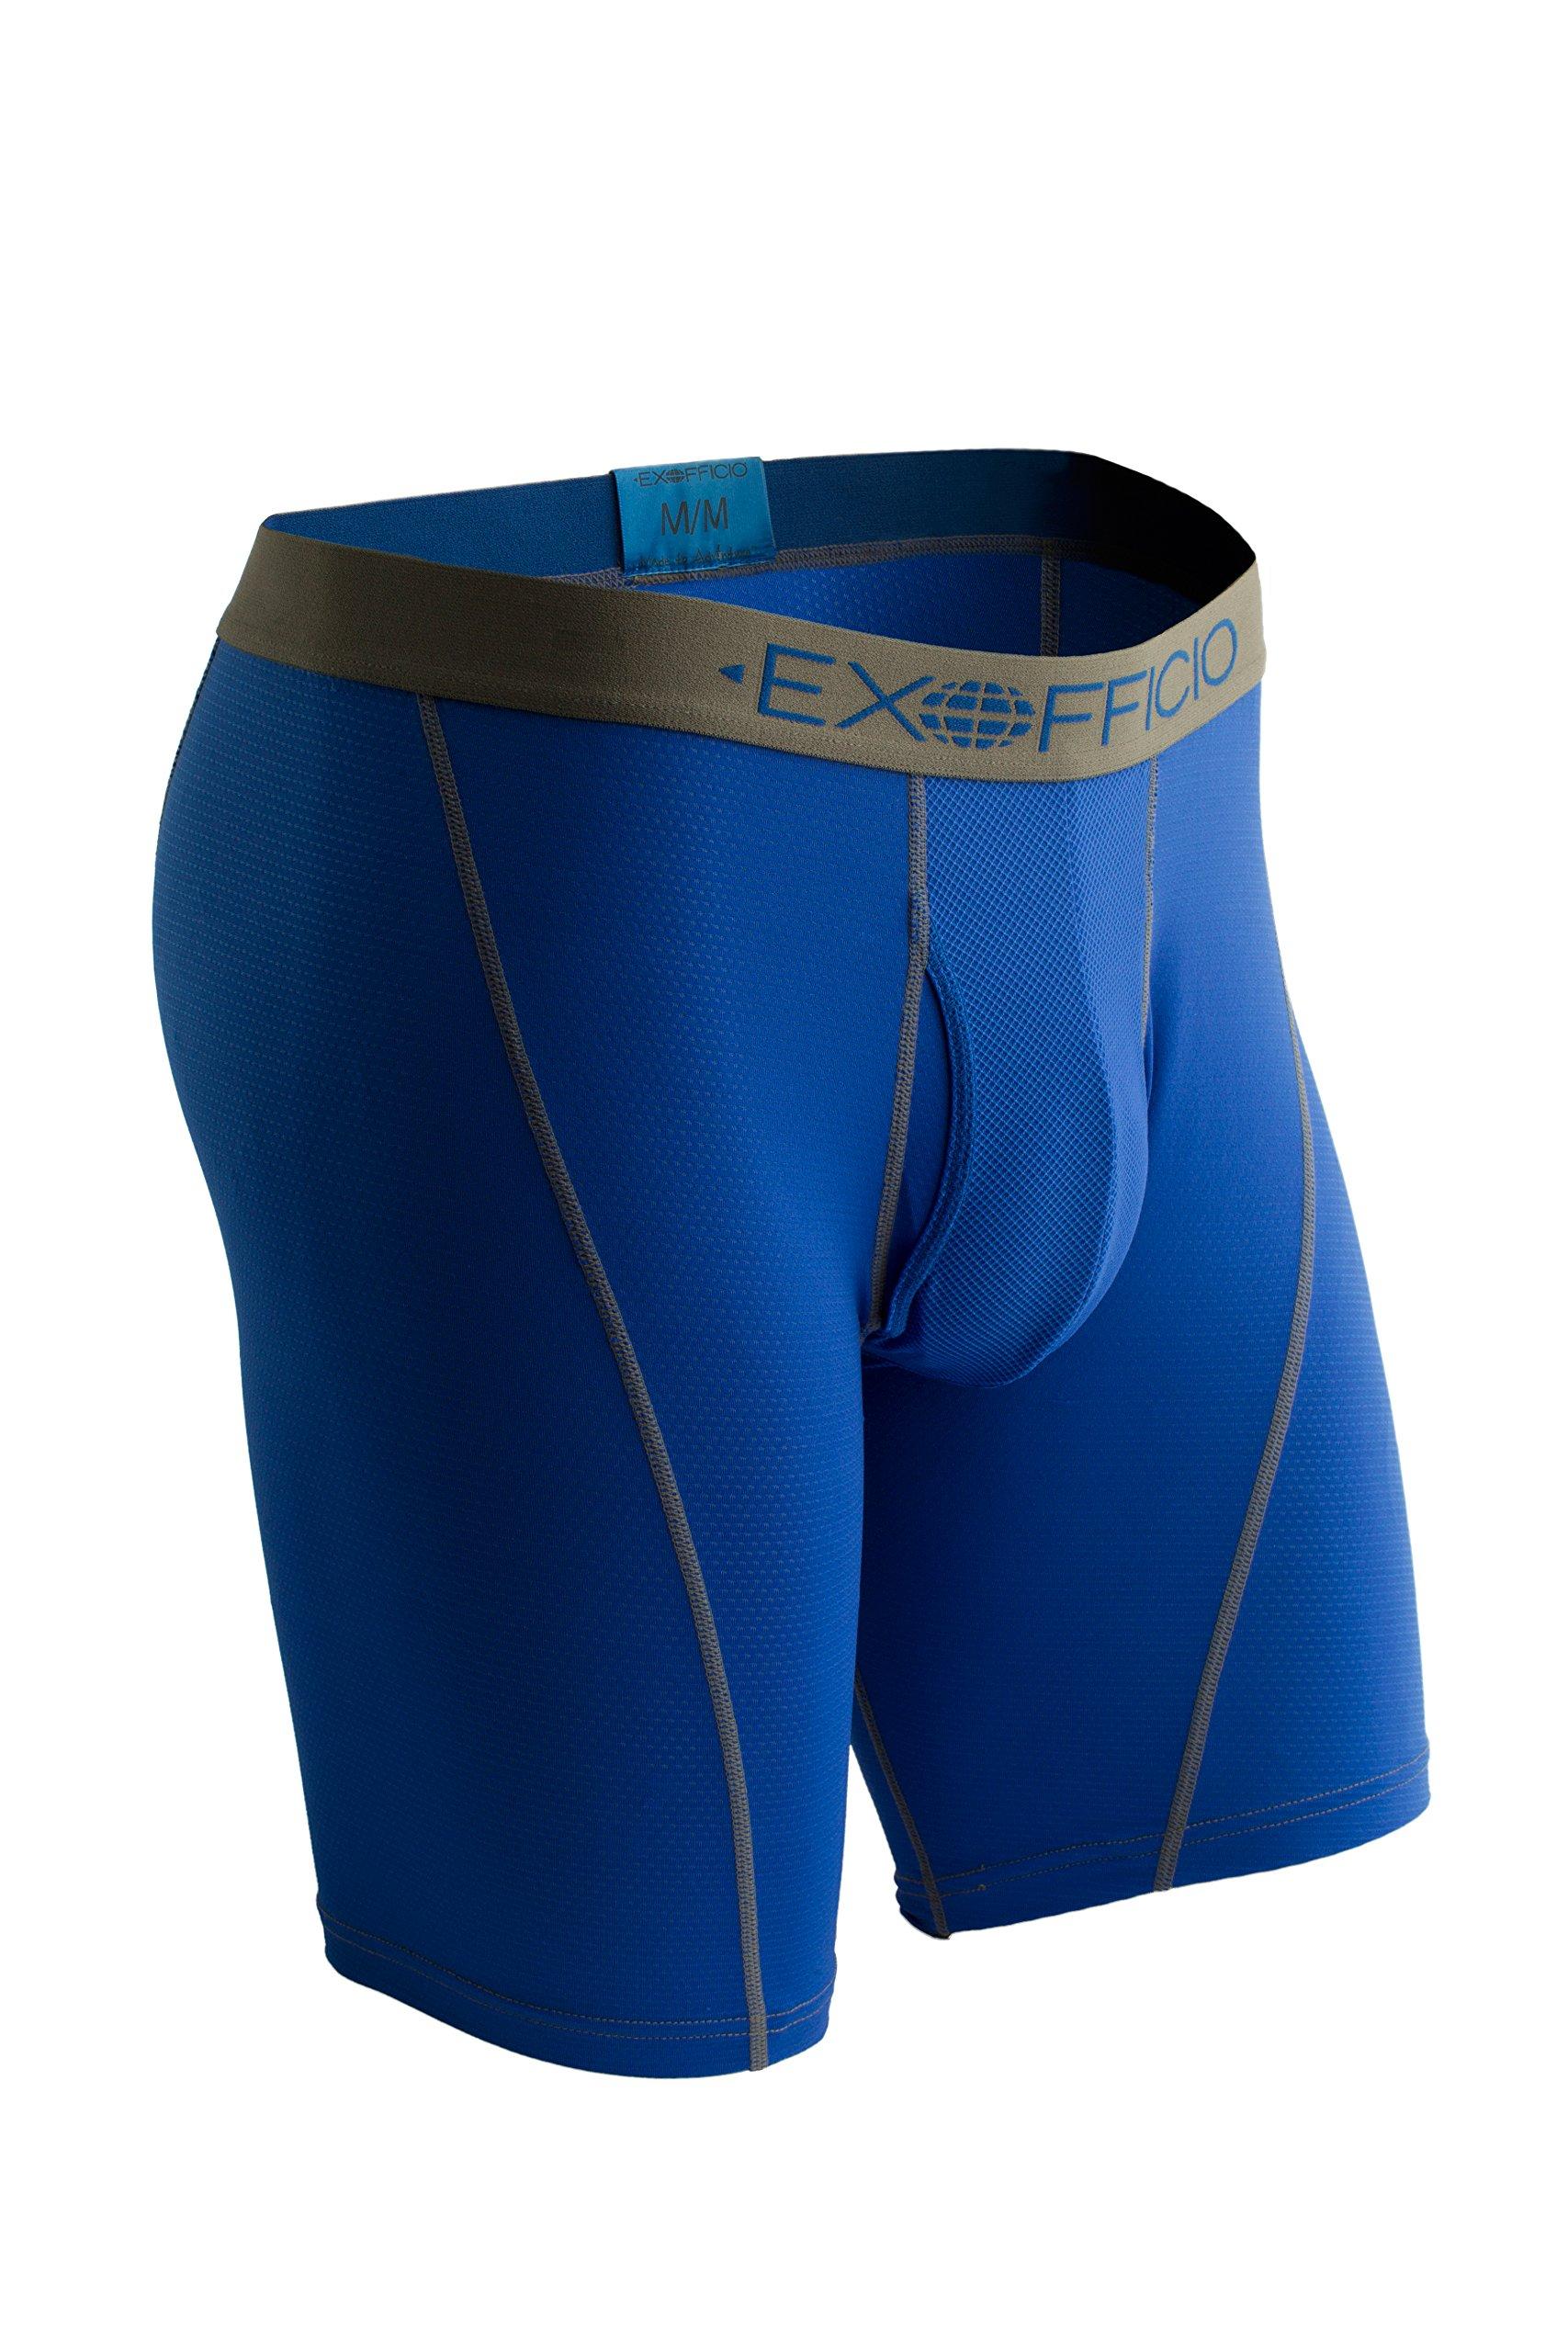 ExOfficio Men's Give-N-Go Sport Mesh 9'' Boxer Brief,X-Large,Royal